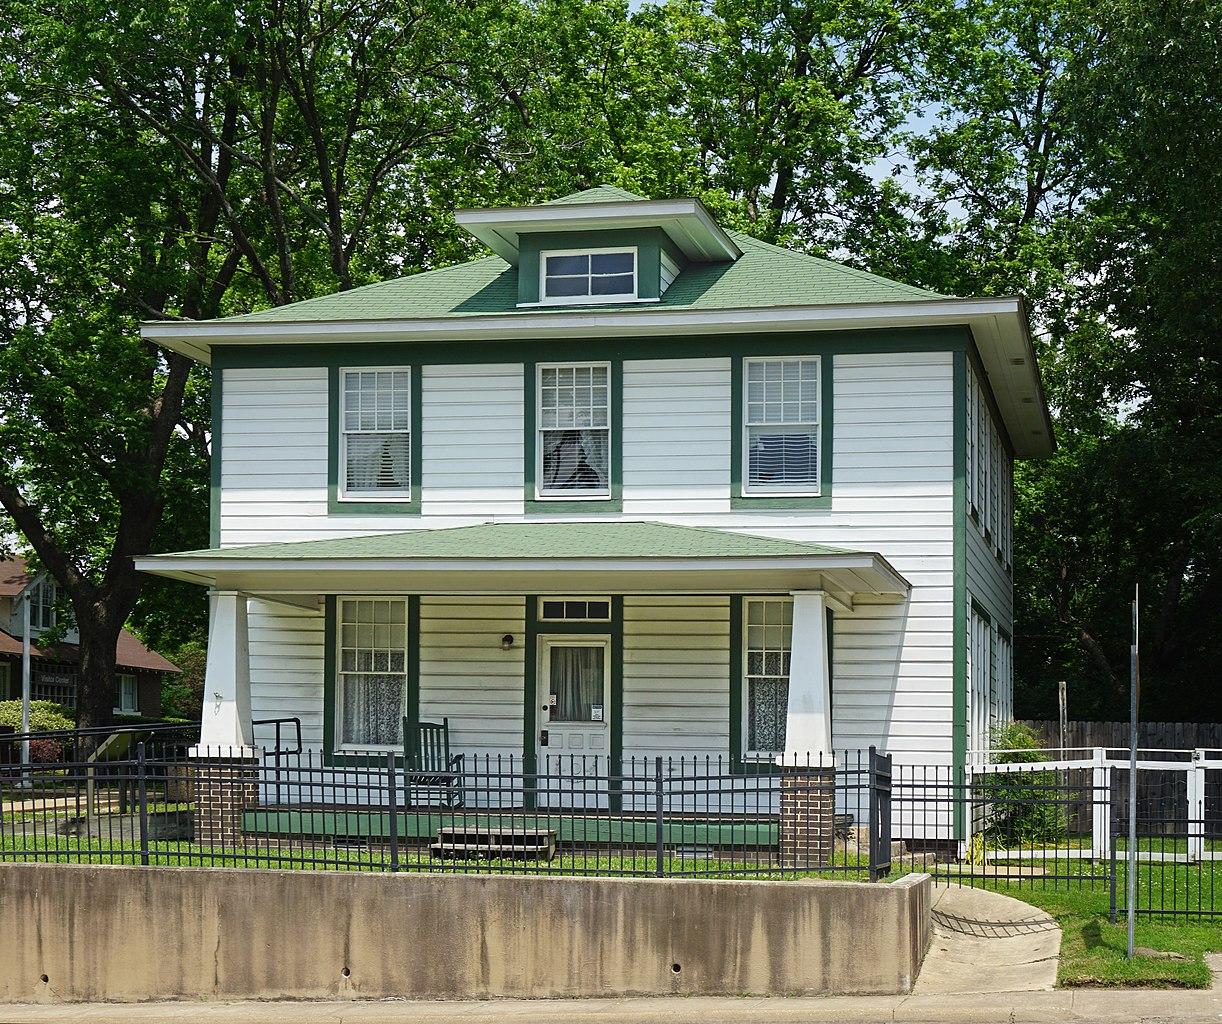 Beautiful Place In Arkansas-Hope, President William Jefferson Clinton's Birthplace